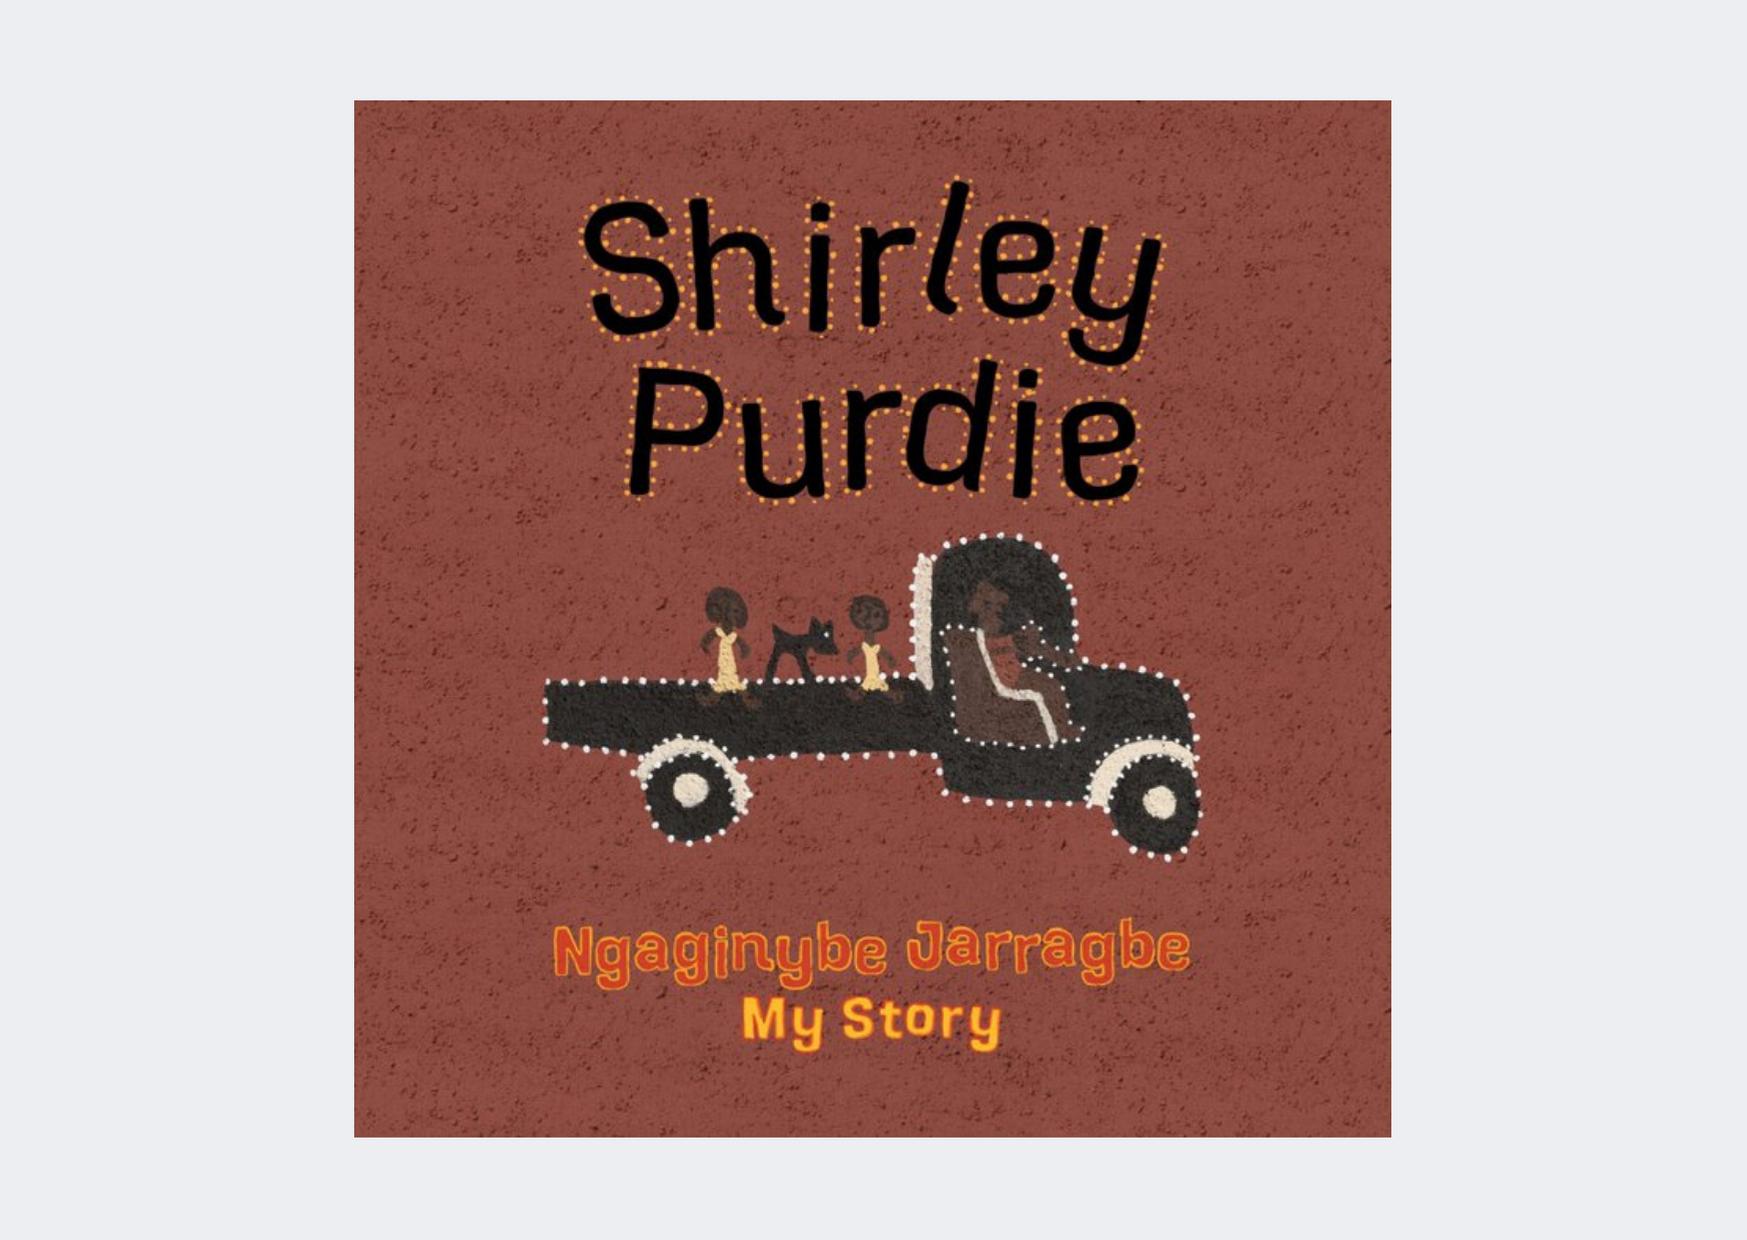 Magabala - Shirley Purdie: My Story